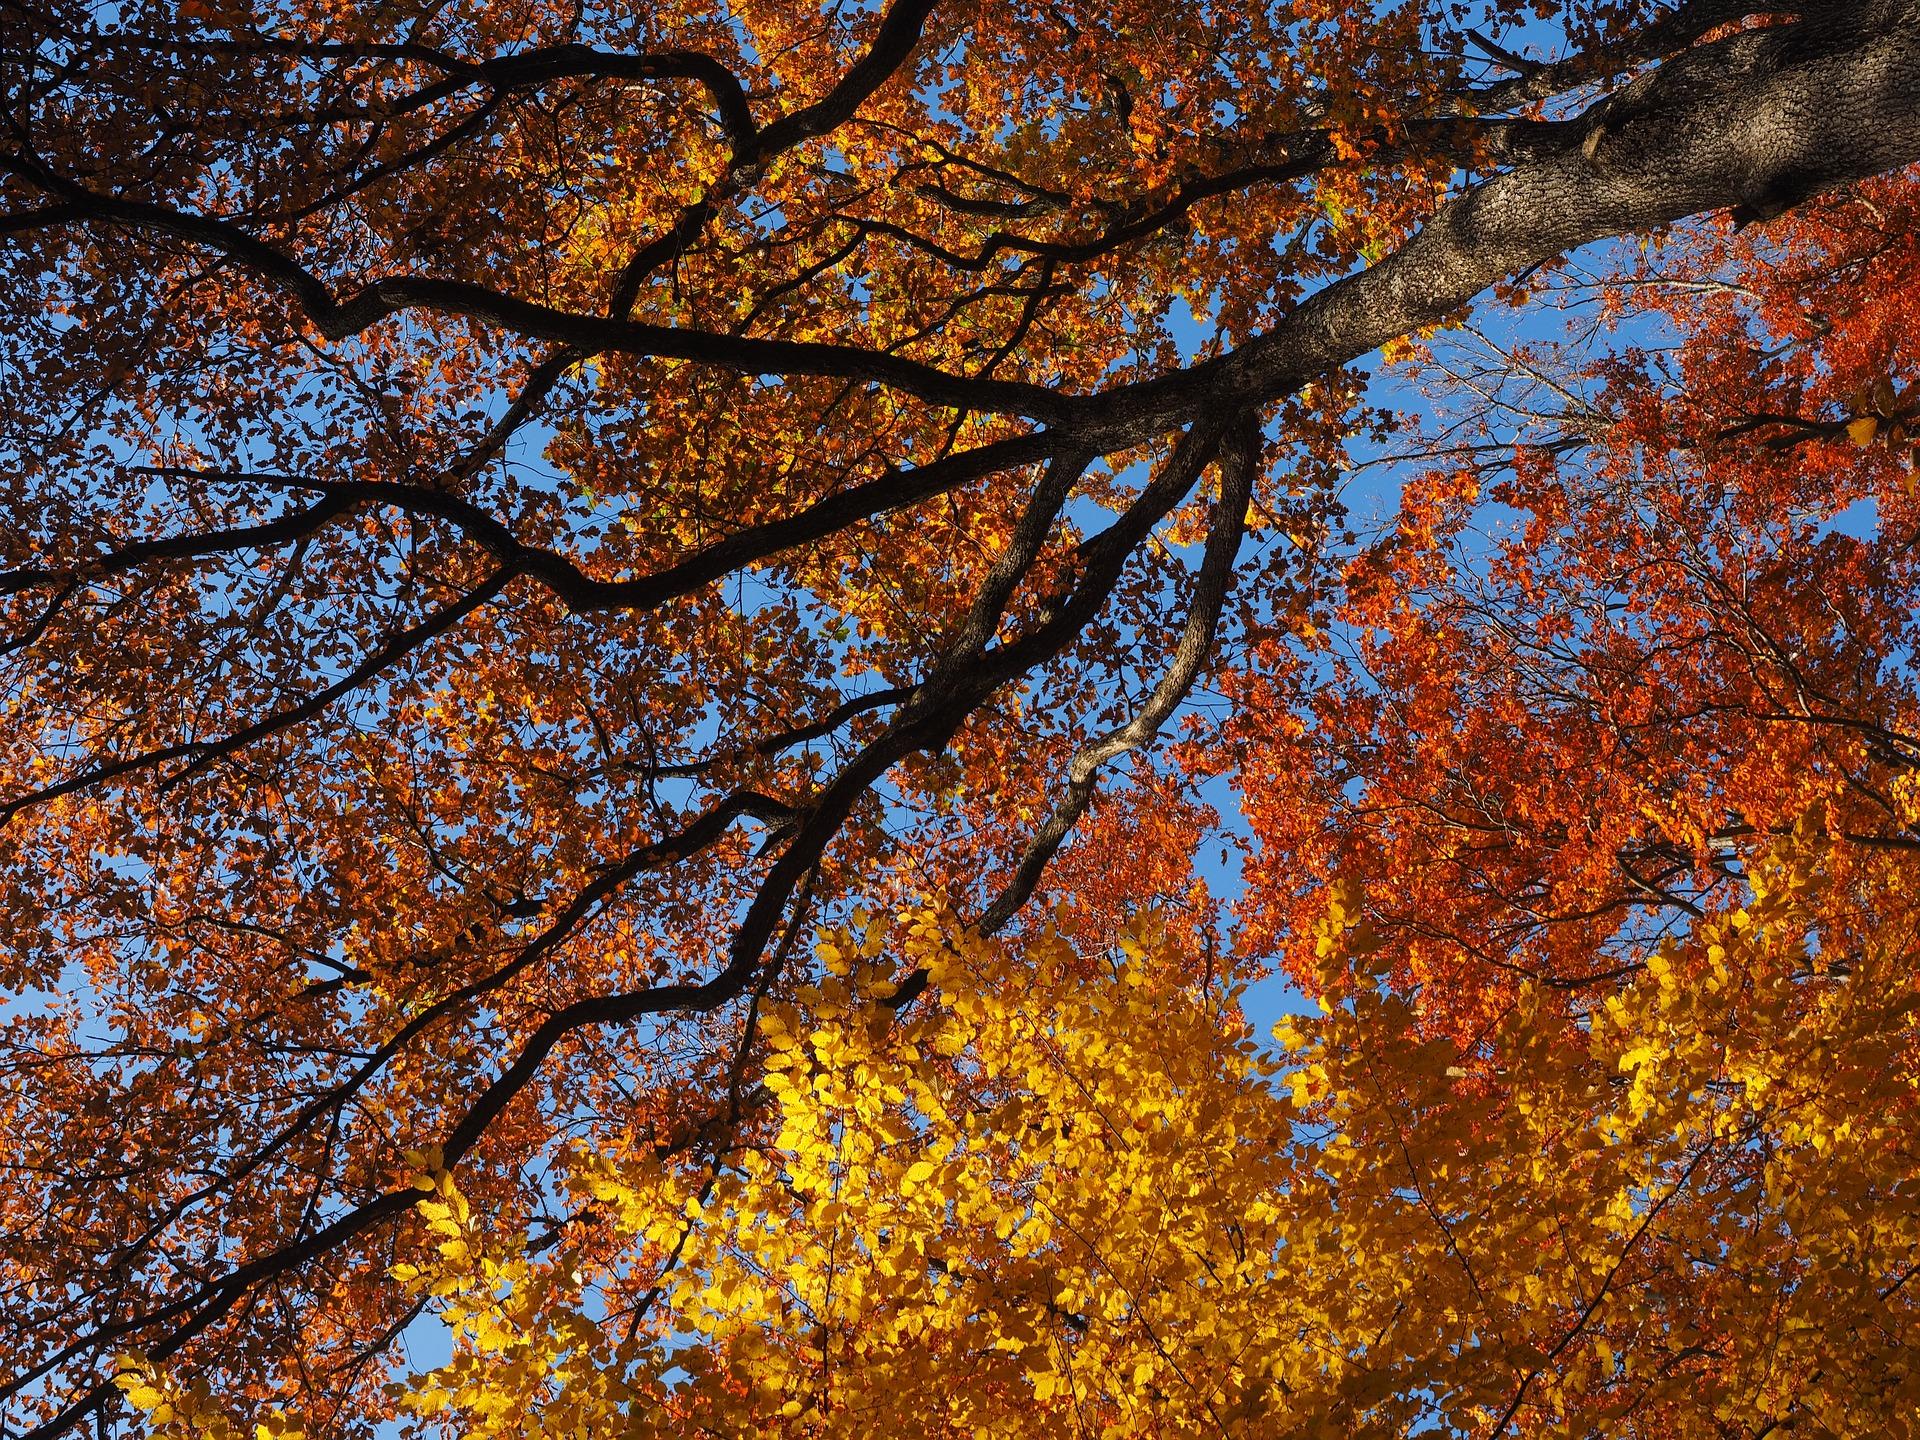 Tree Service - Care